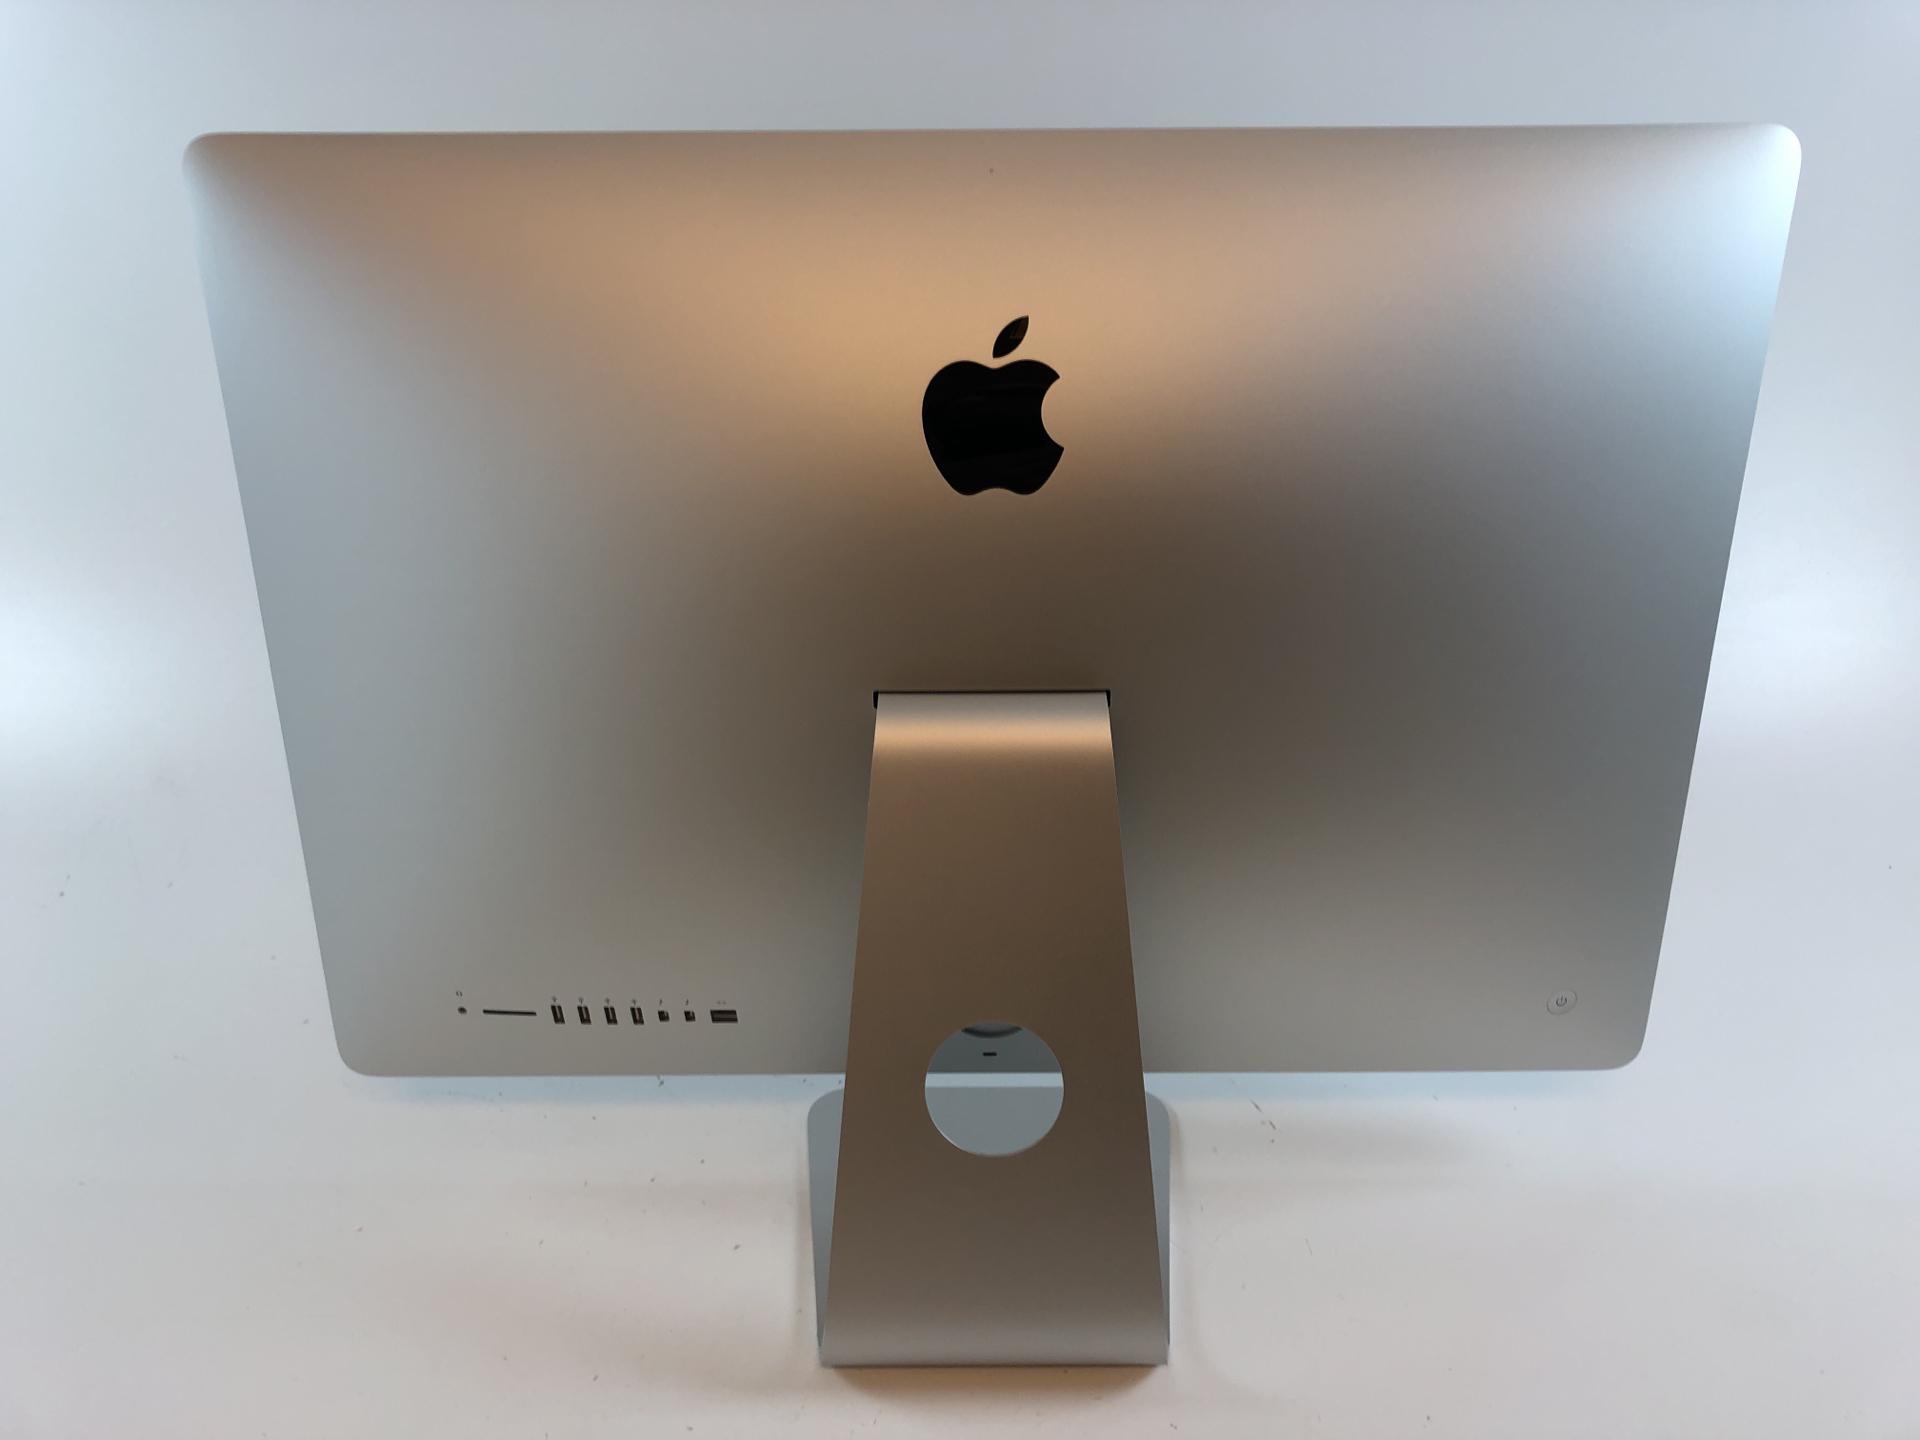 "iMac 27"" Retina 5K Late 2014 (Intel Quad-Core i5 3.5 GHz 16 GB RAM 1 TB Fusion Drive), Intel Quad-Core i5 3.5 GHz, 16 GB RAM, 1 TB Fusion Drive, Kuva 2"